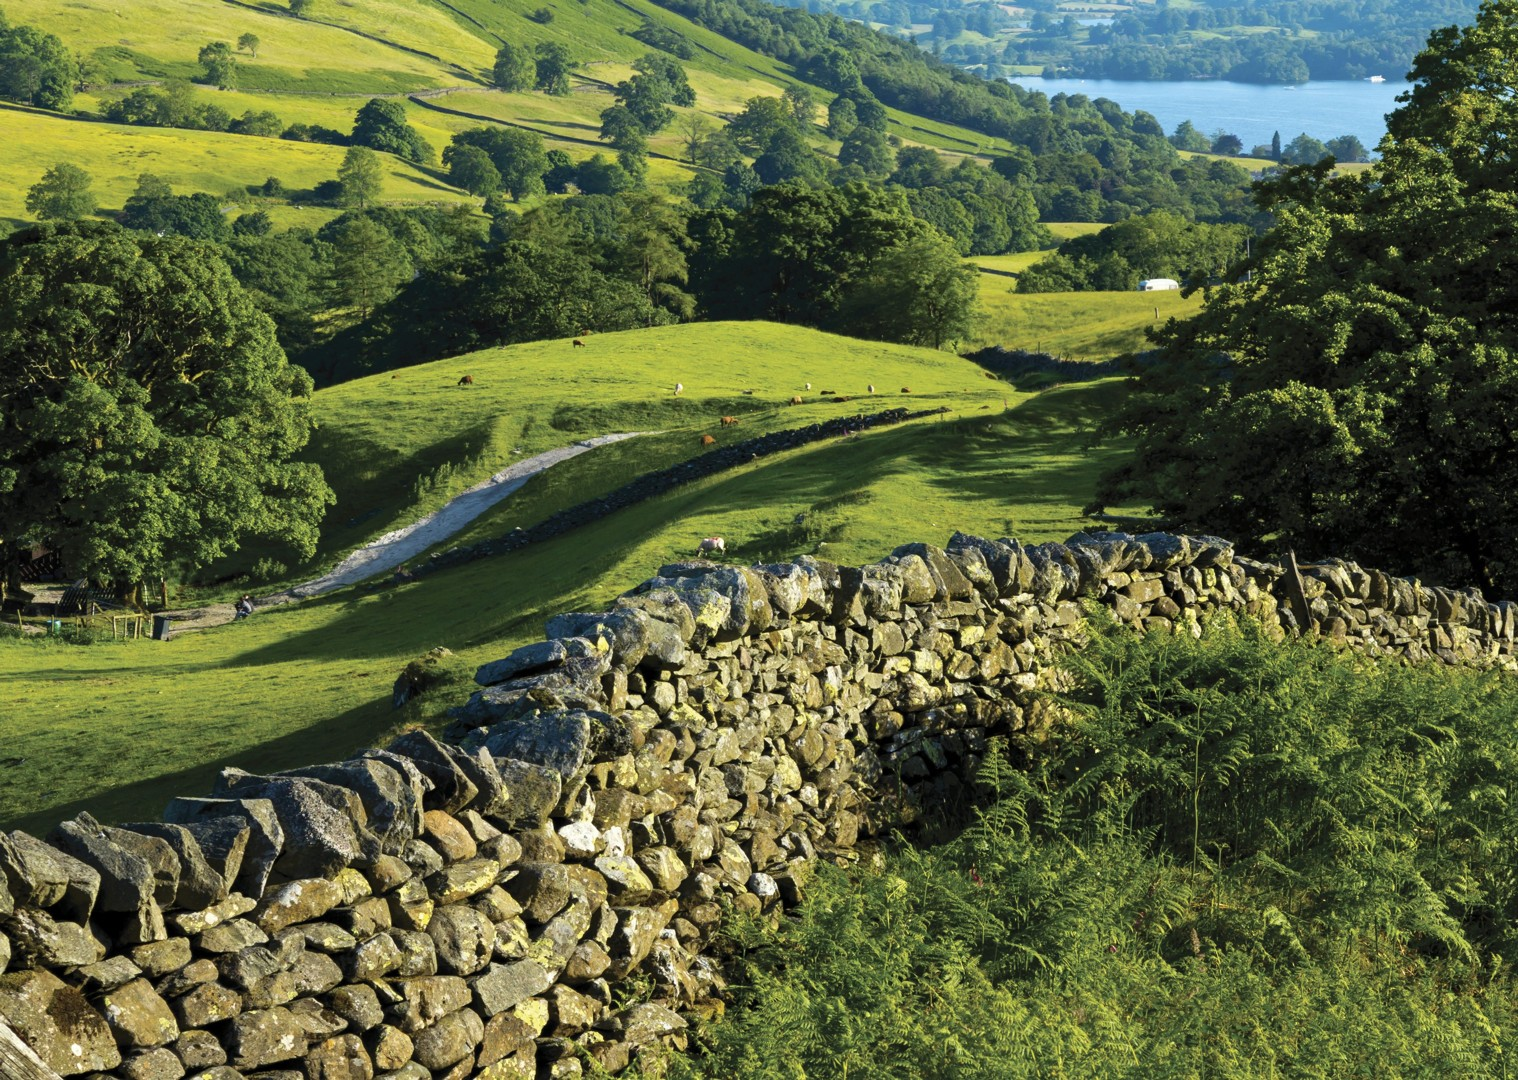 leisure-cycling-holiday-lakedistrict-derwentbank-nature.jpg - UK - Lake District - Derwent Water - Self-Guided Leisure Cycling Holiday - Leisure Cycling